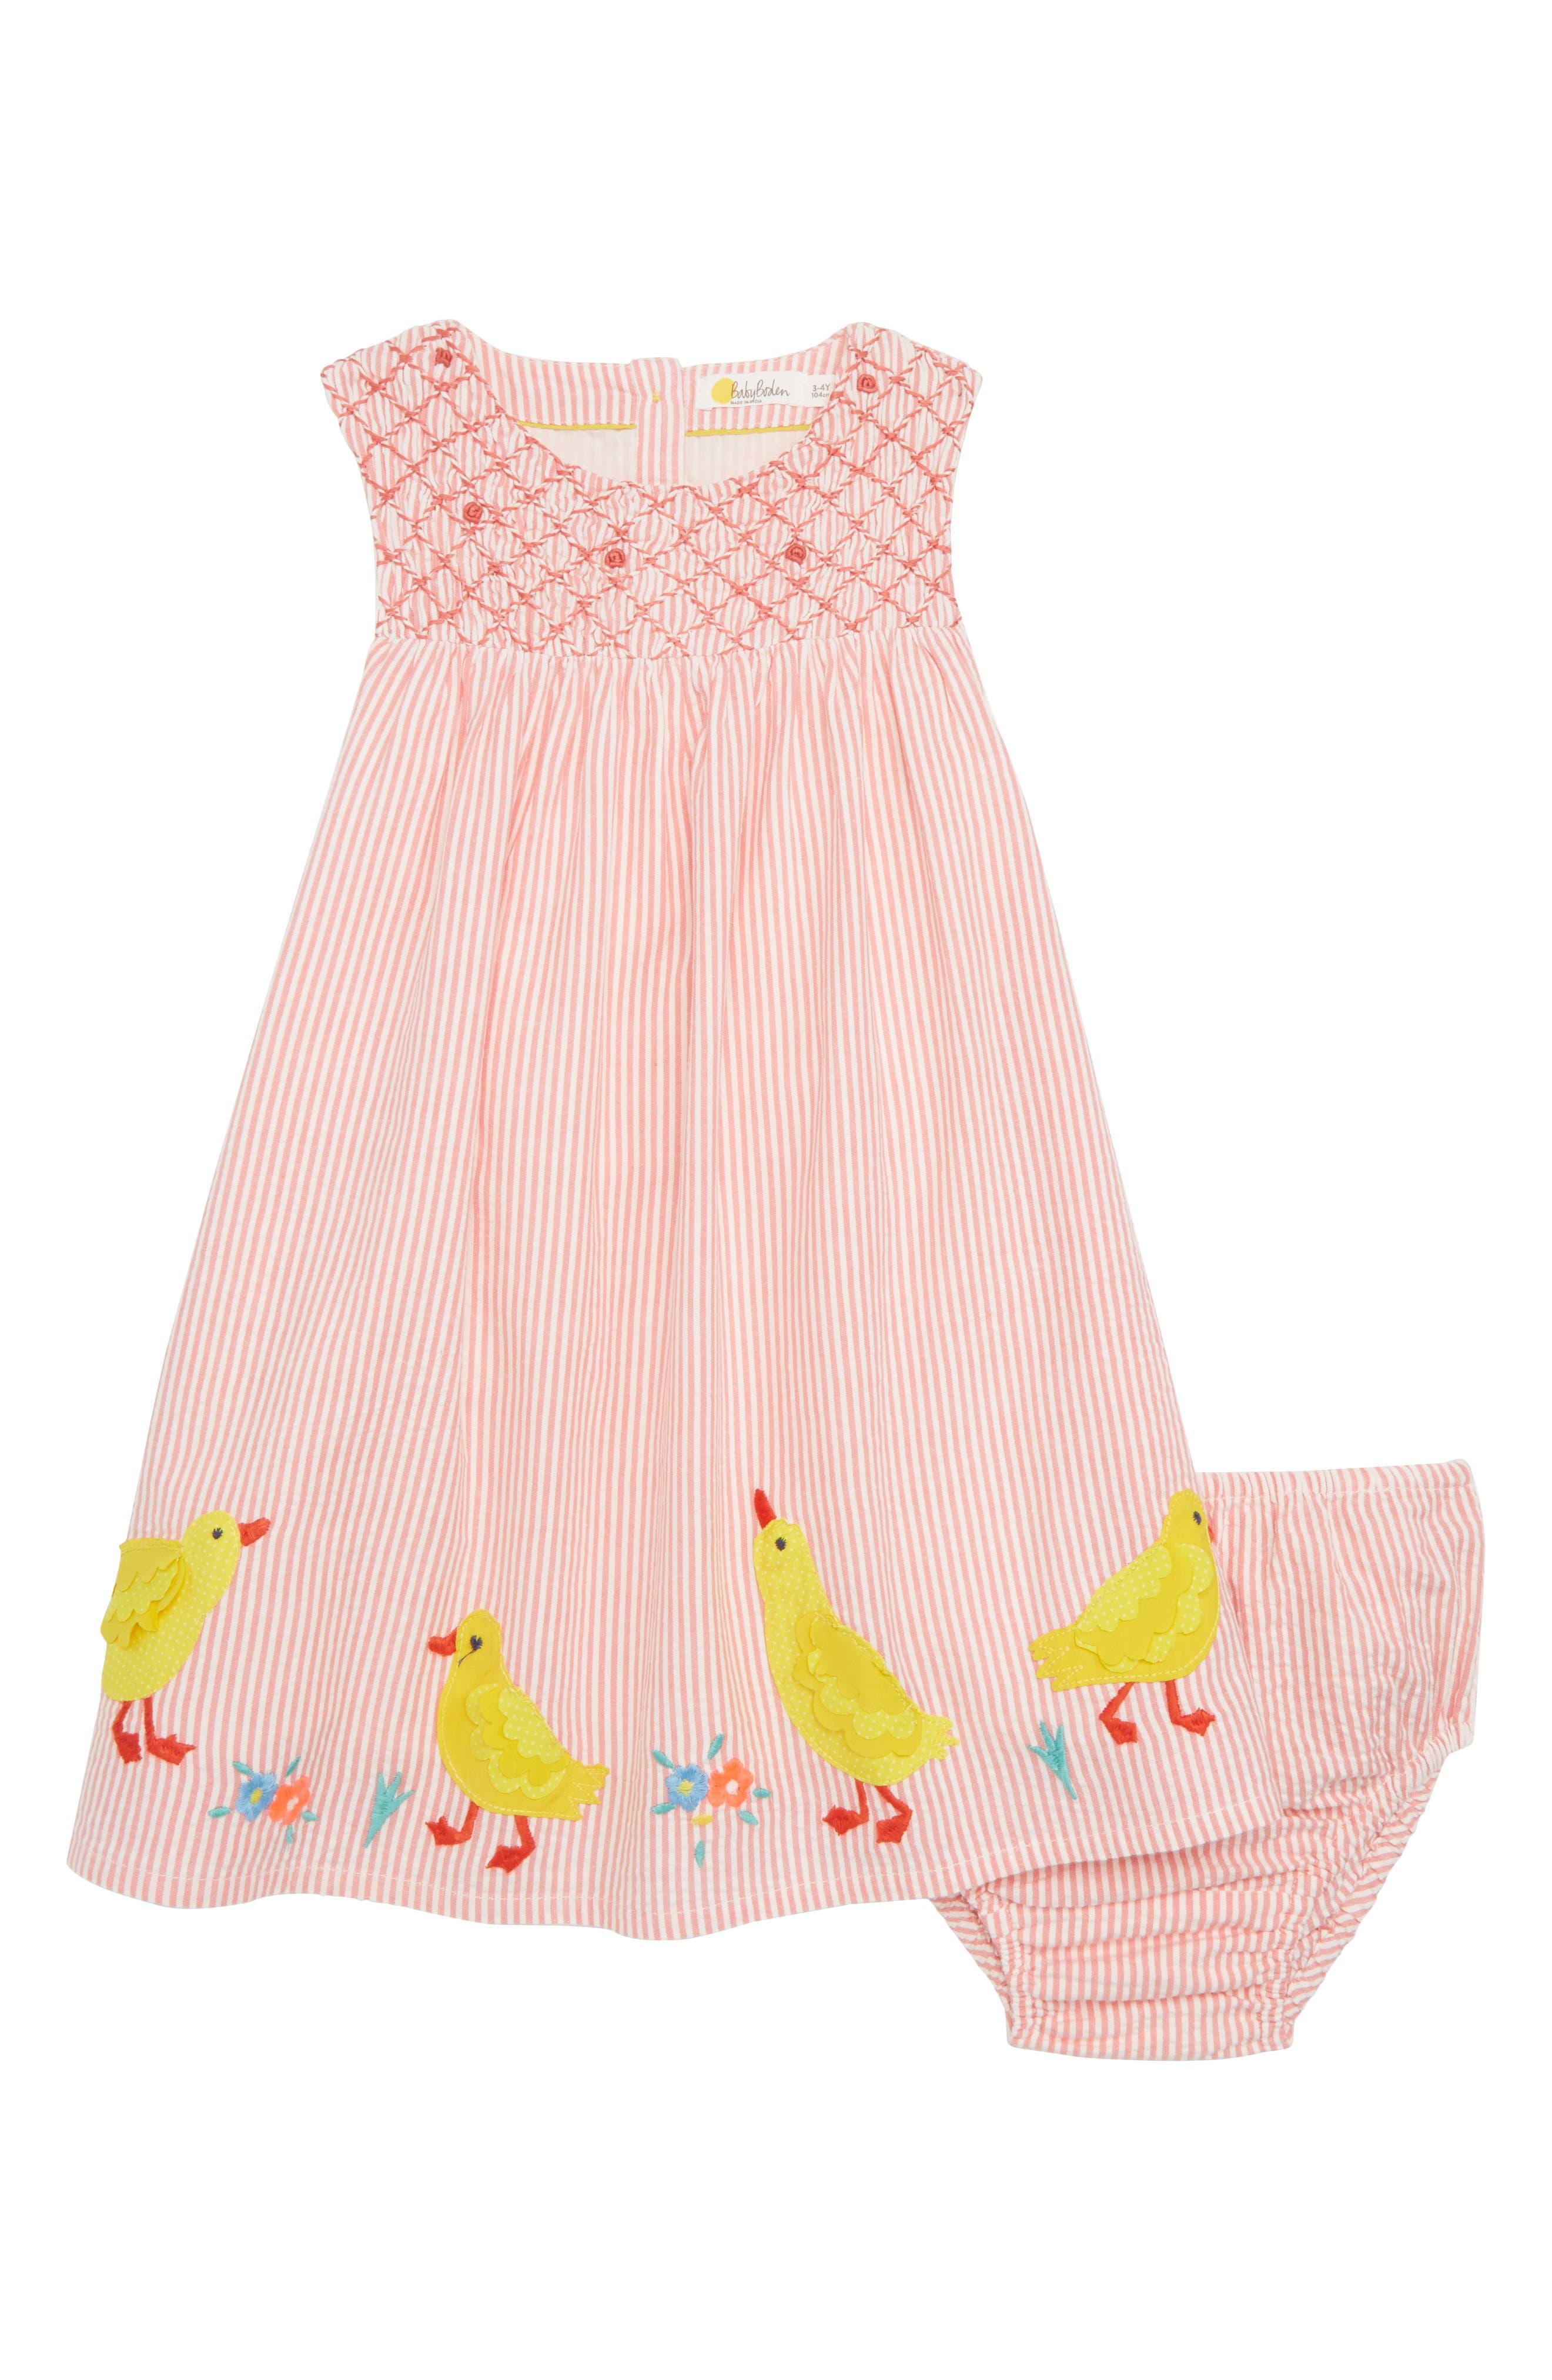 Smocked Chick Appliqué Dress,                         Main,                         color, 684